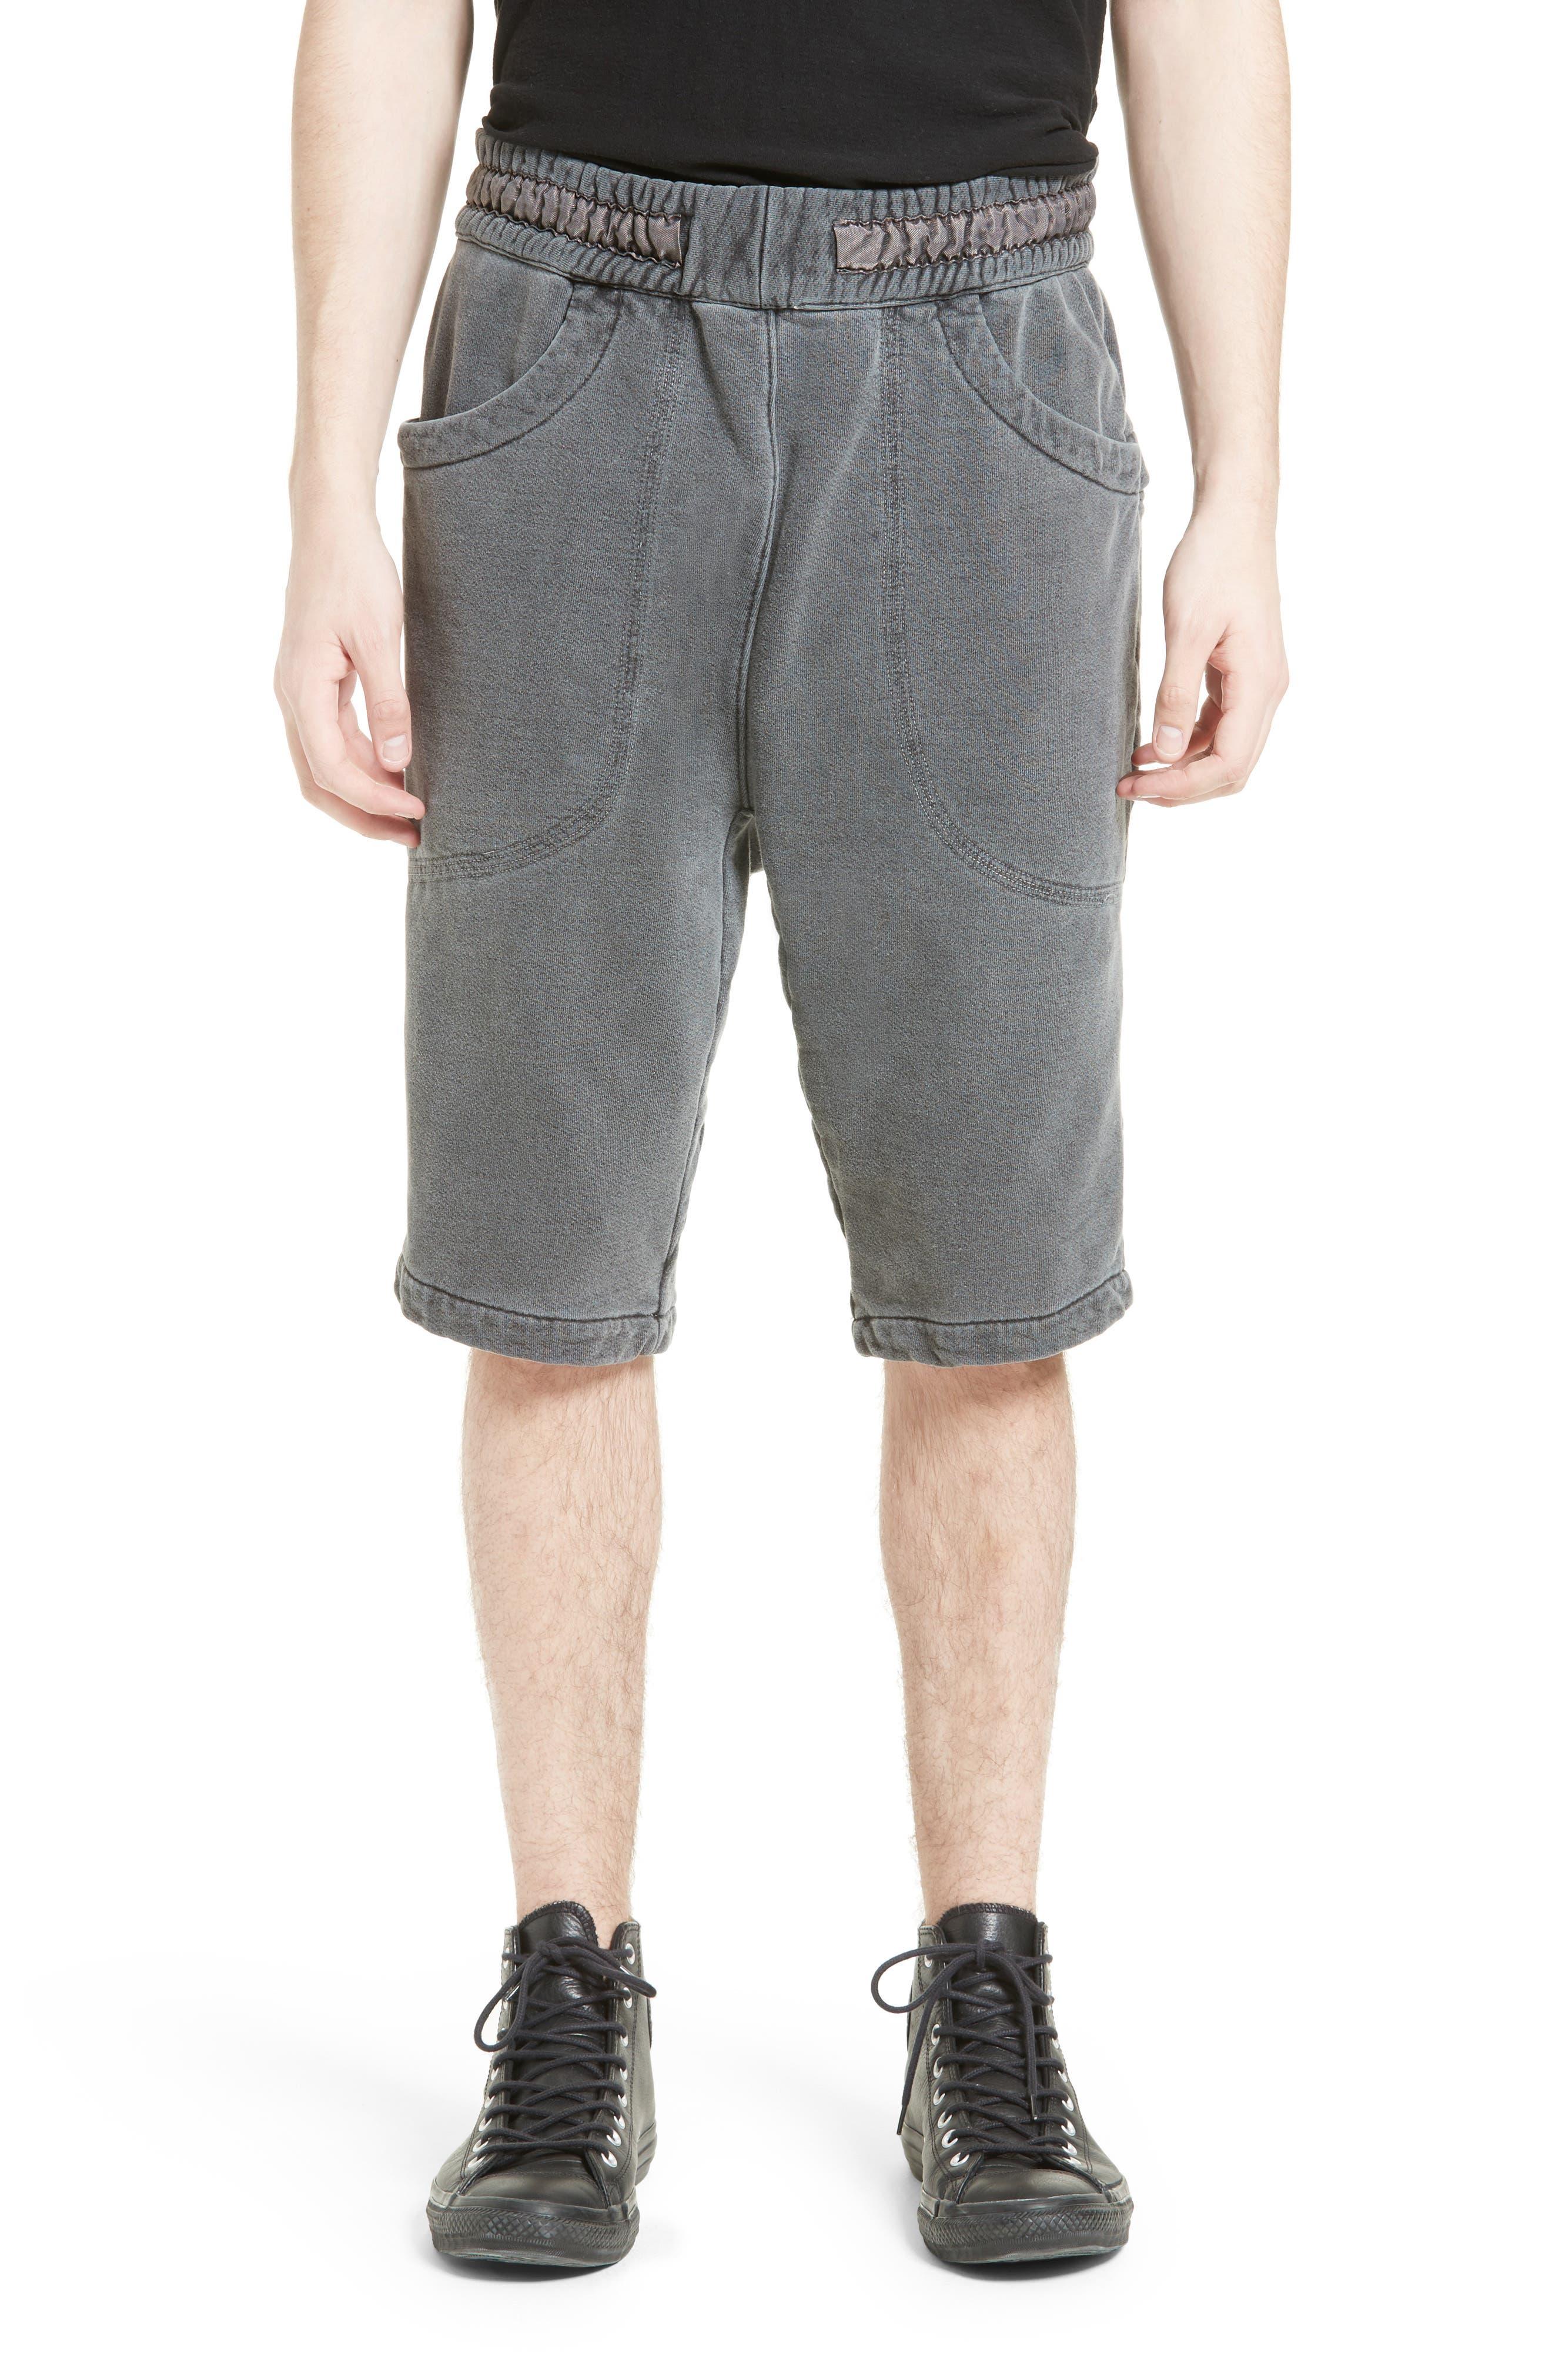 Quark Sweat Shorts,                         Main,                         color, Black Pigment